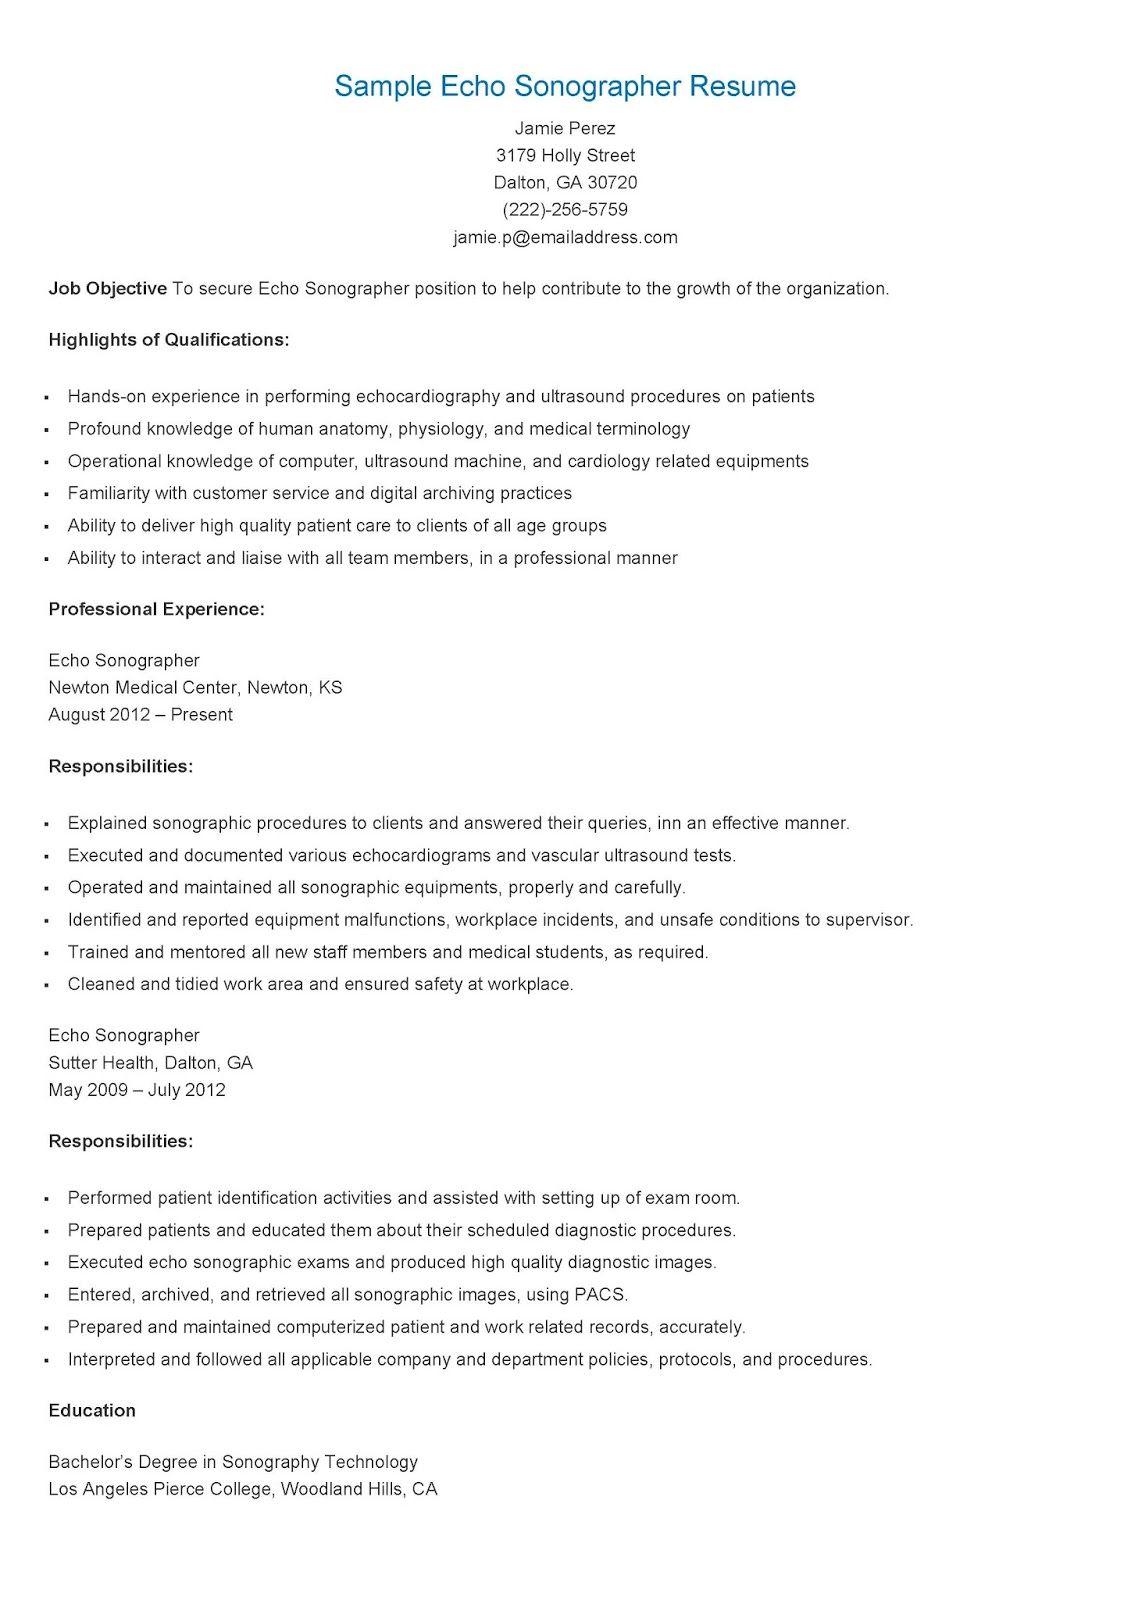 Sample Echo Sonographer Resume Sonographer, Writing help